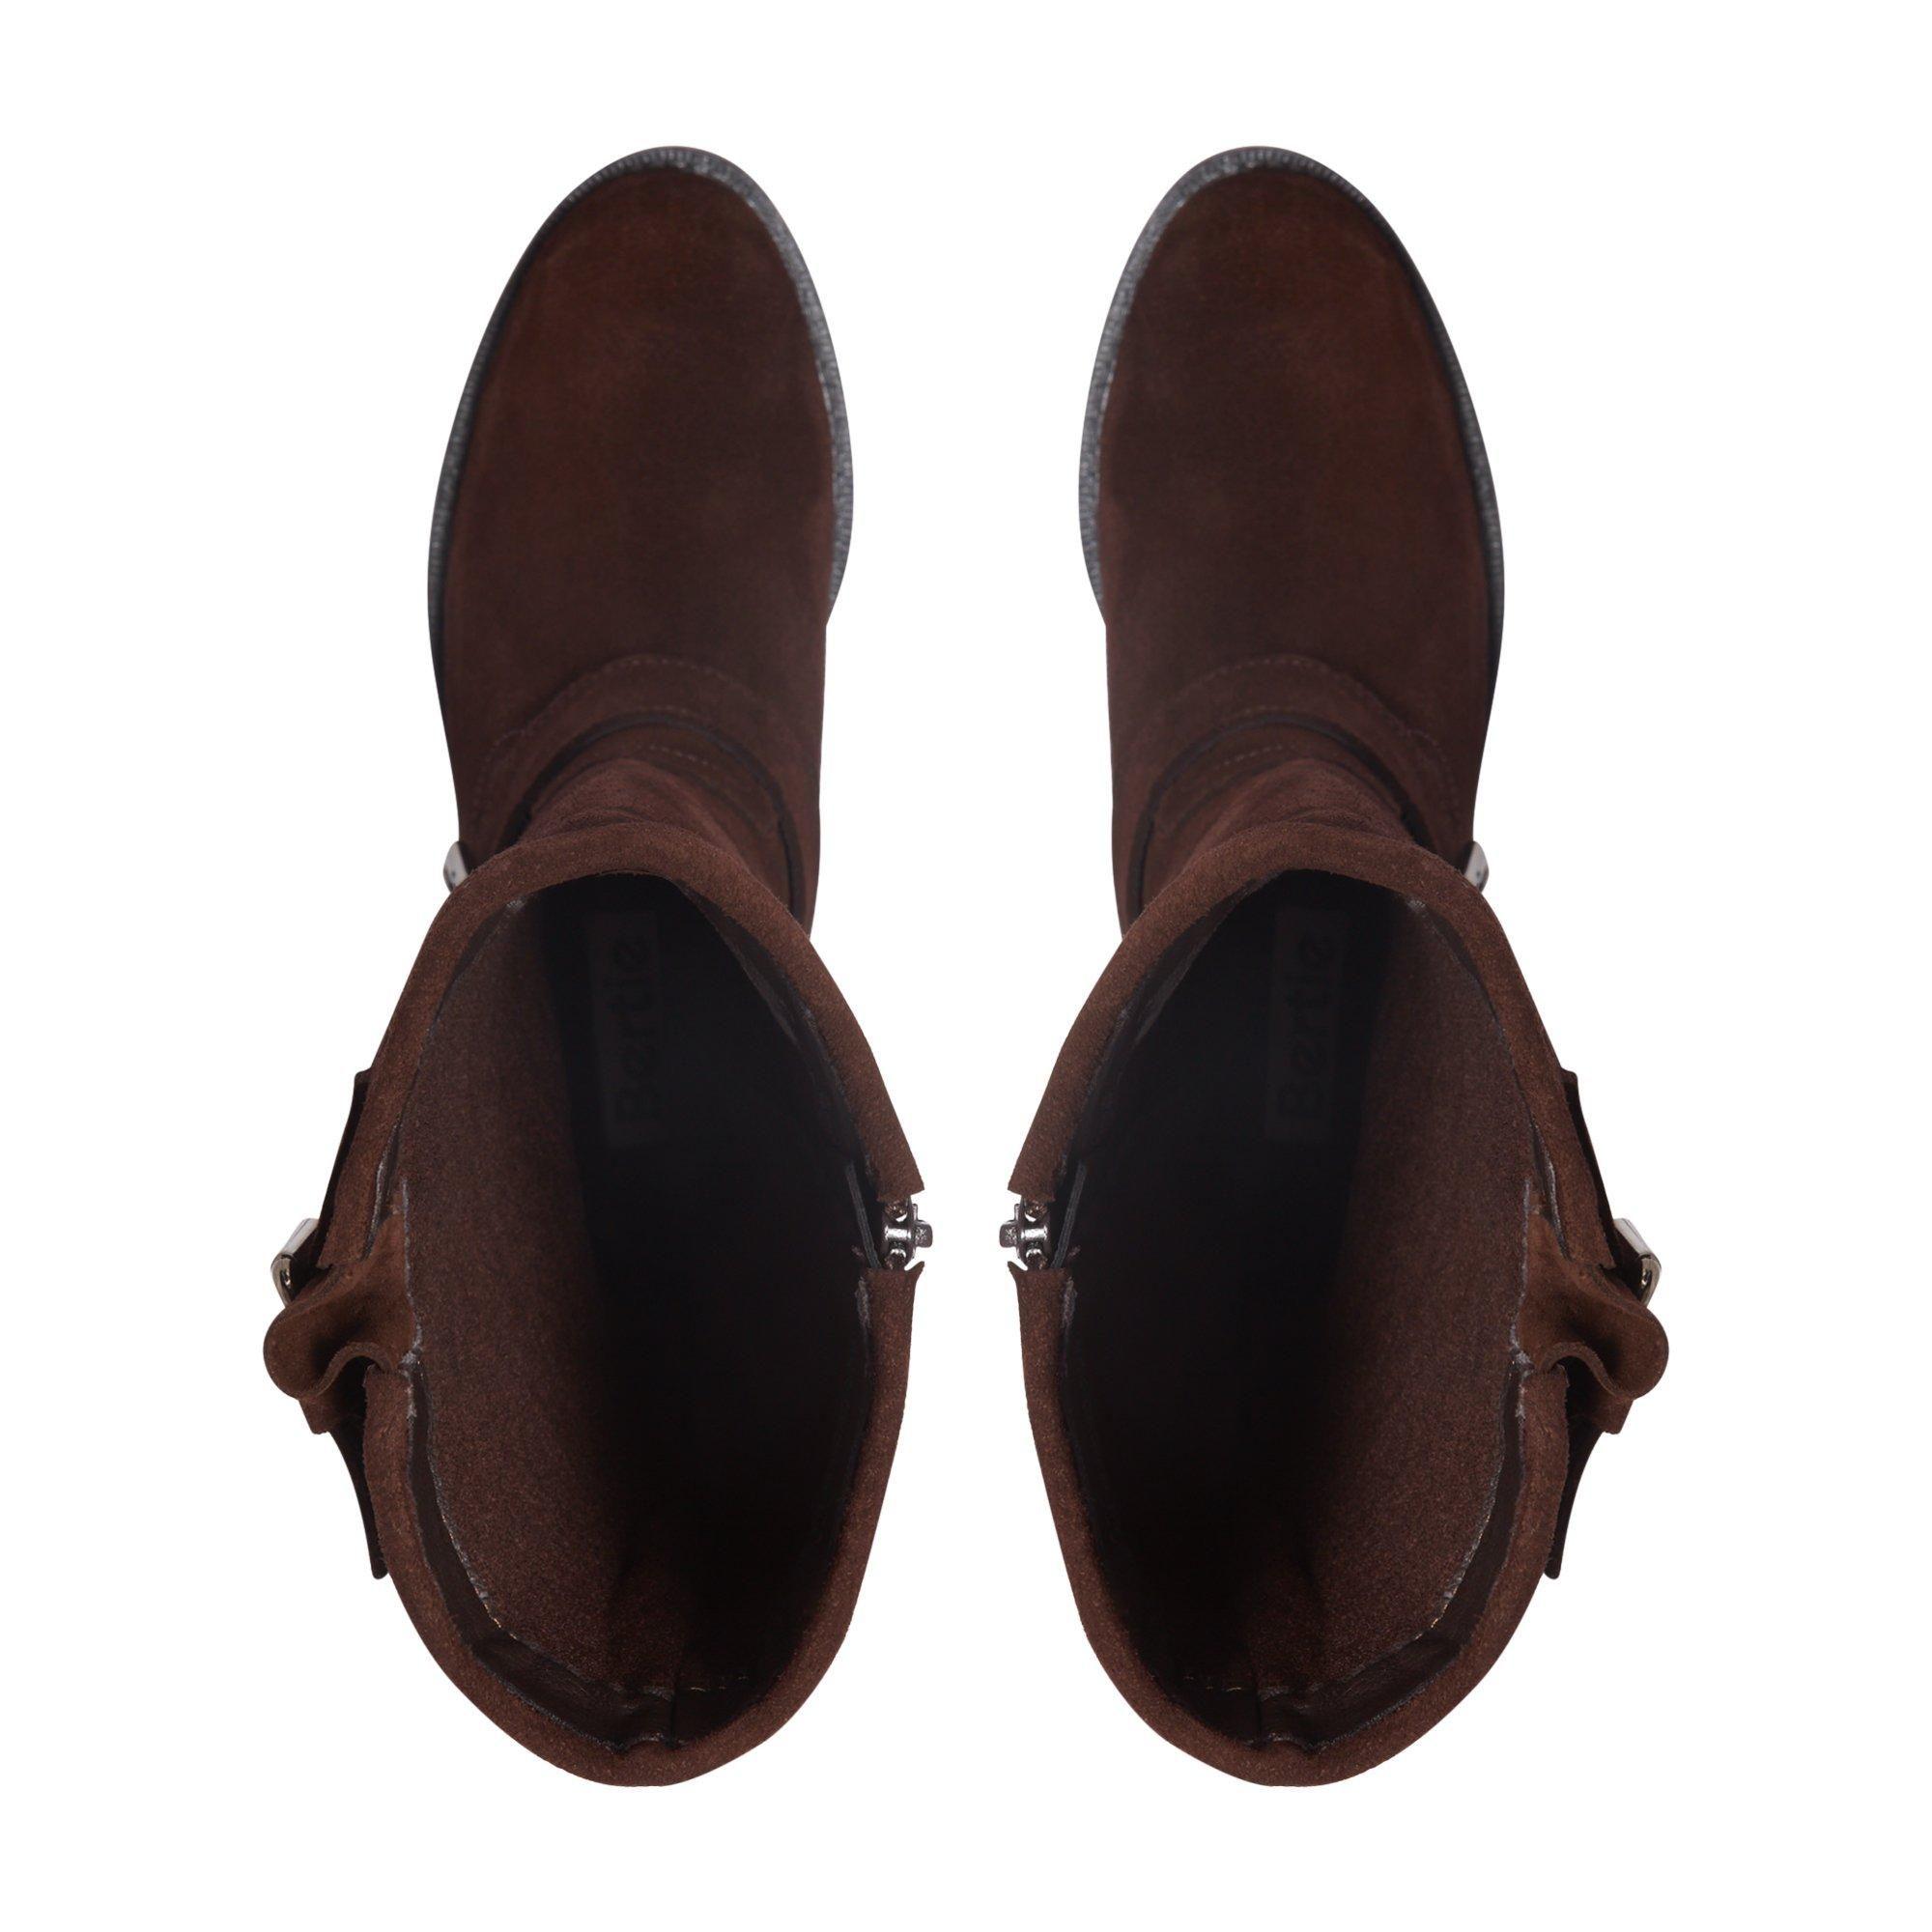 Bertie Ladies TRUST Cleated Knee High Boots